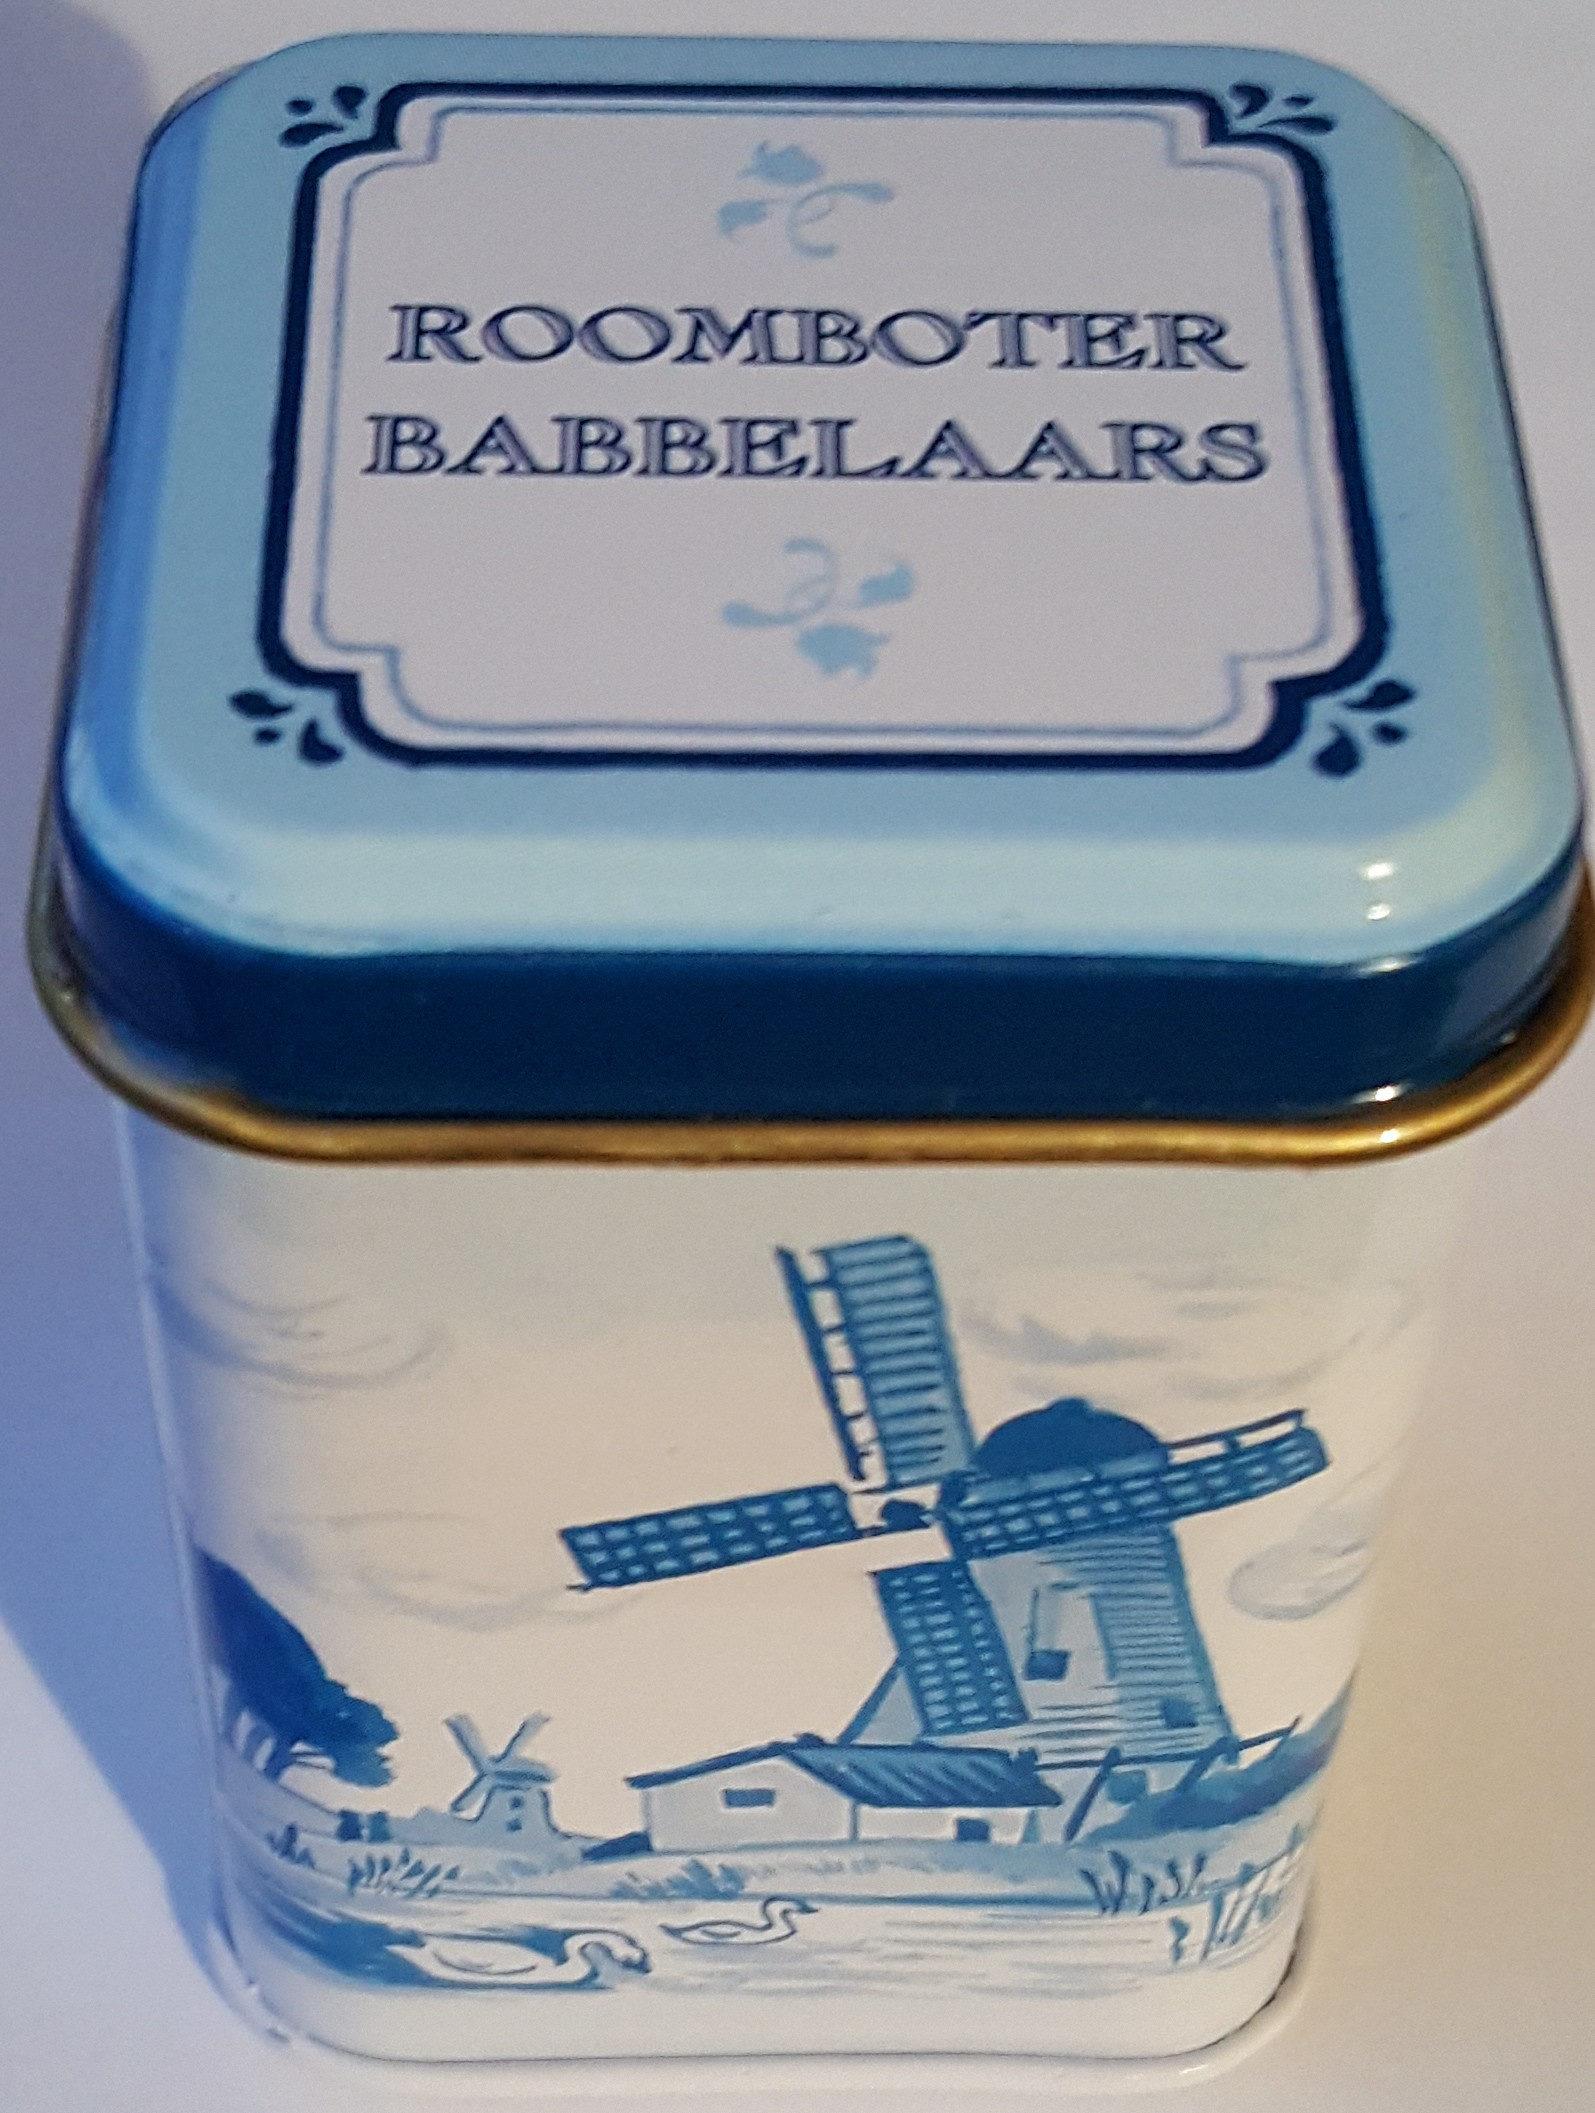 Roomboter Babbelaars - Reine Butter Bonbons - Product - de